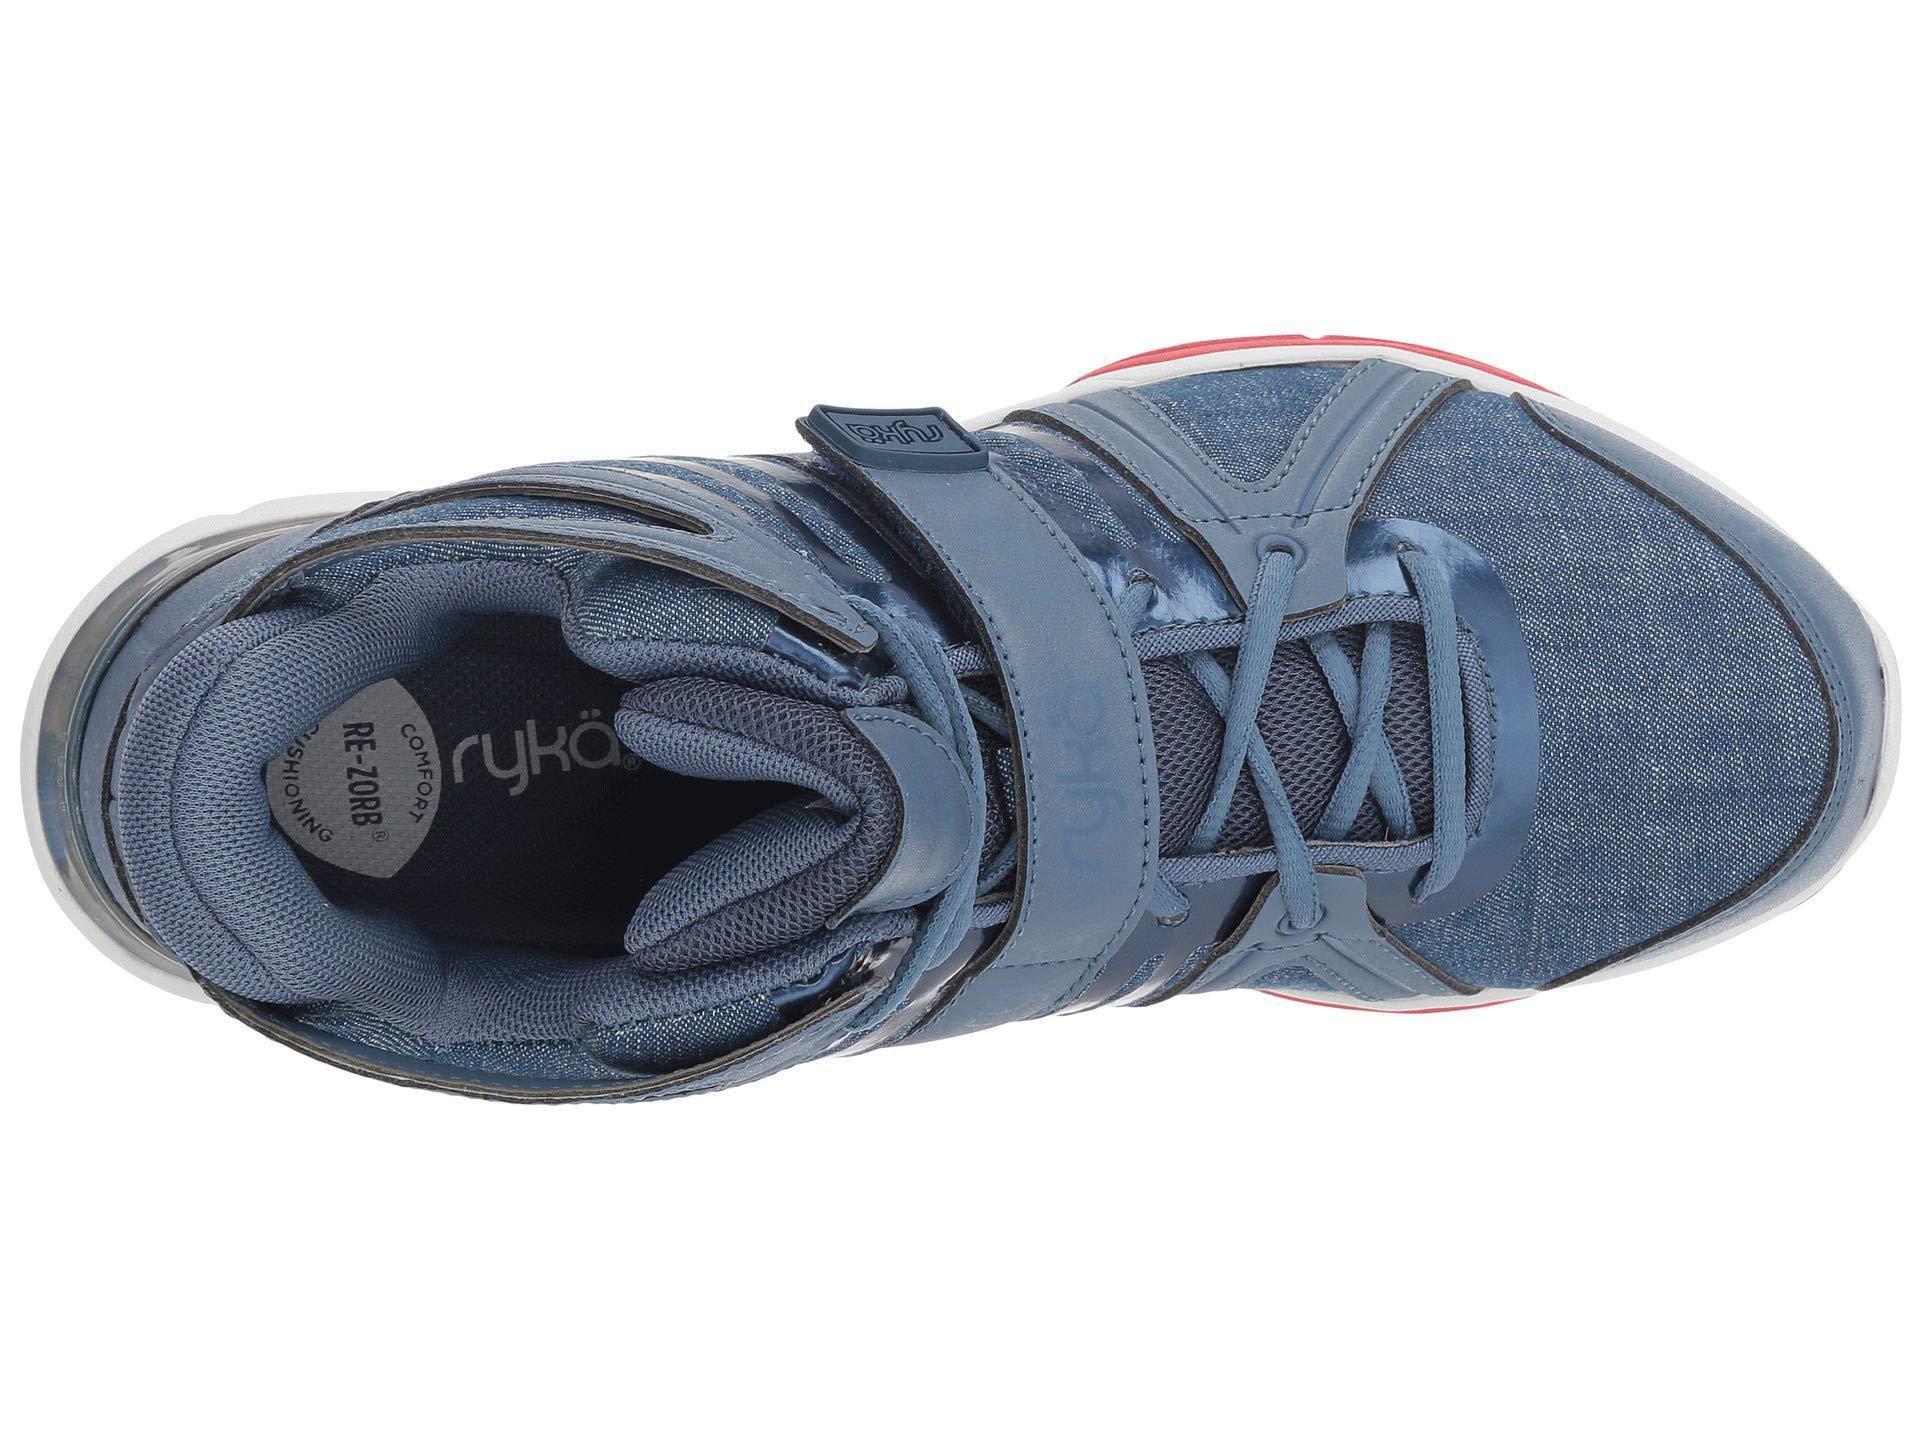 426b2e06e1 Lyst - Ryka Tenacity (chambray) Women s Shoes in Blue